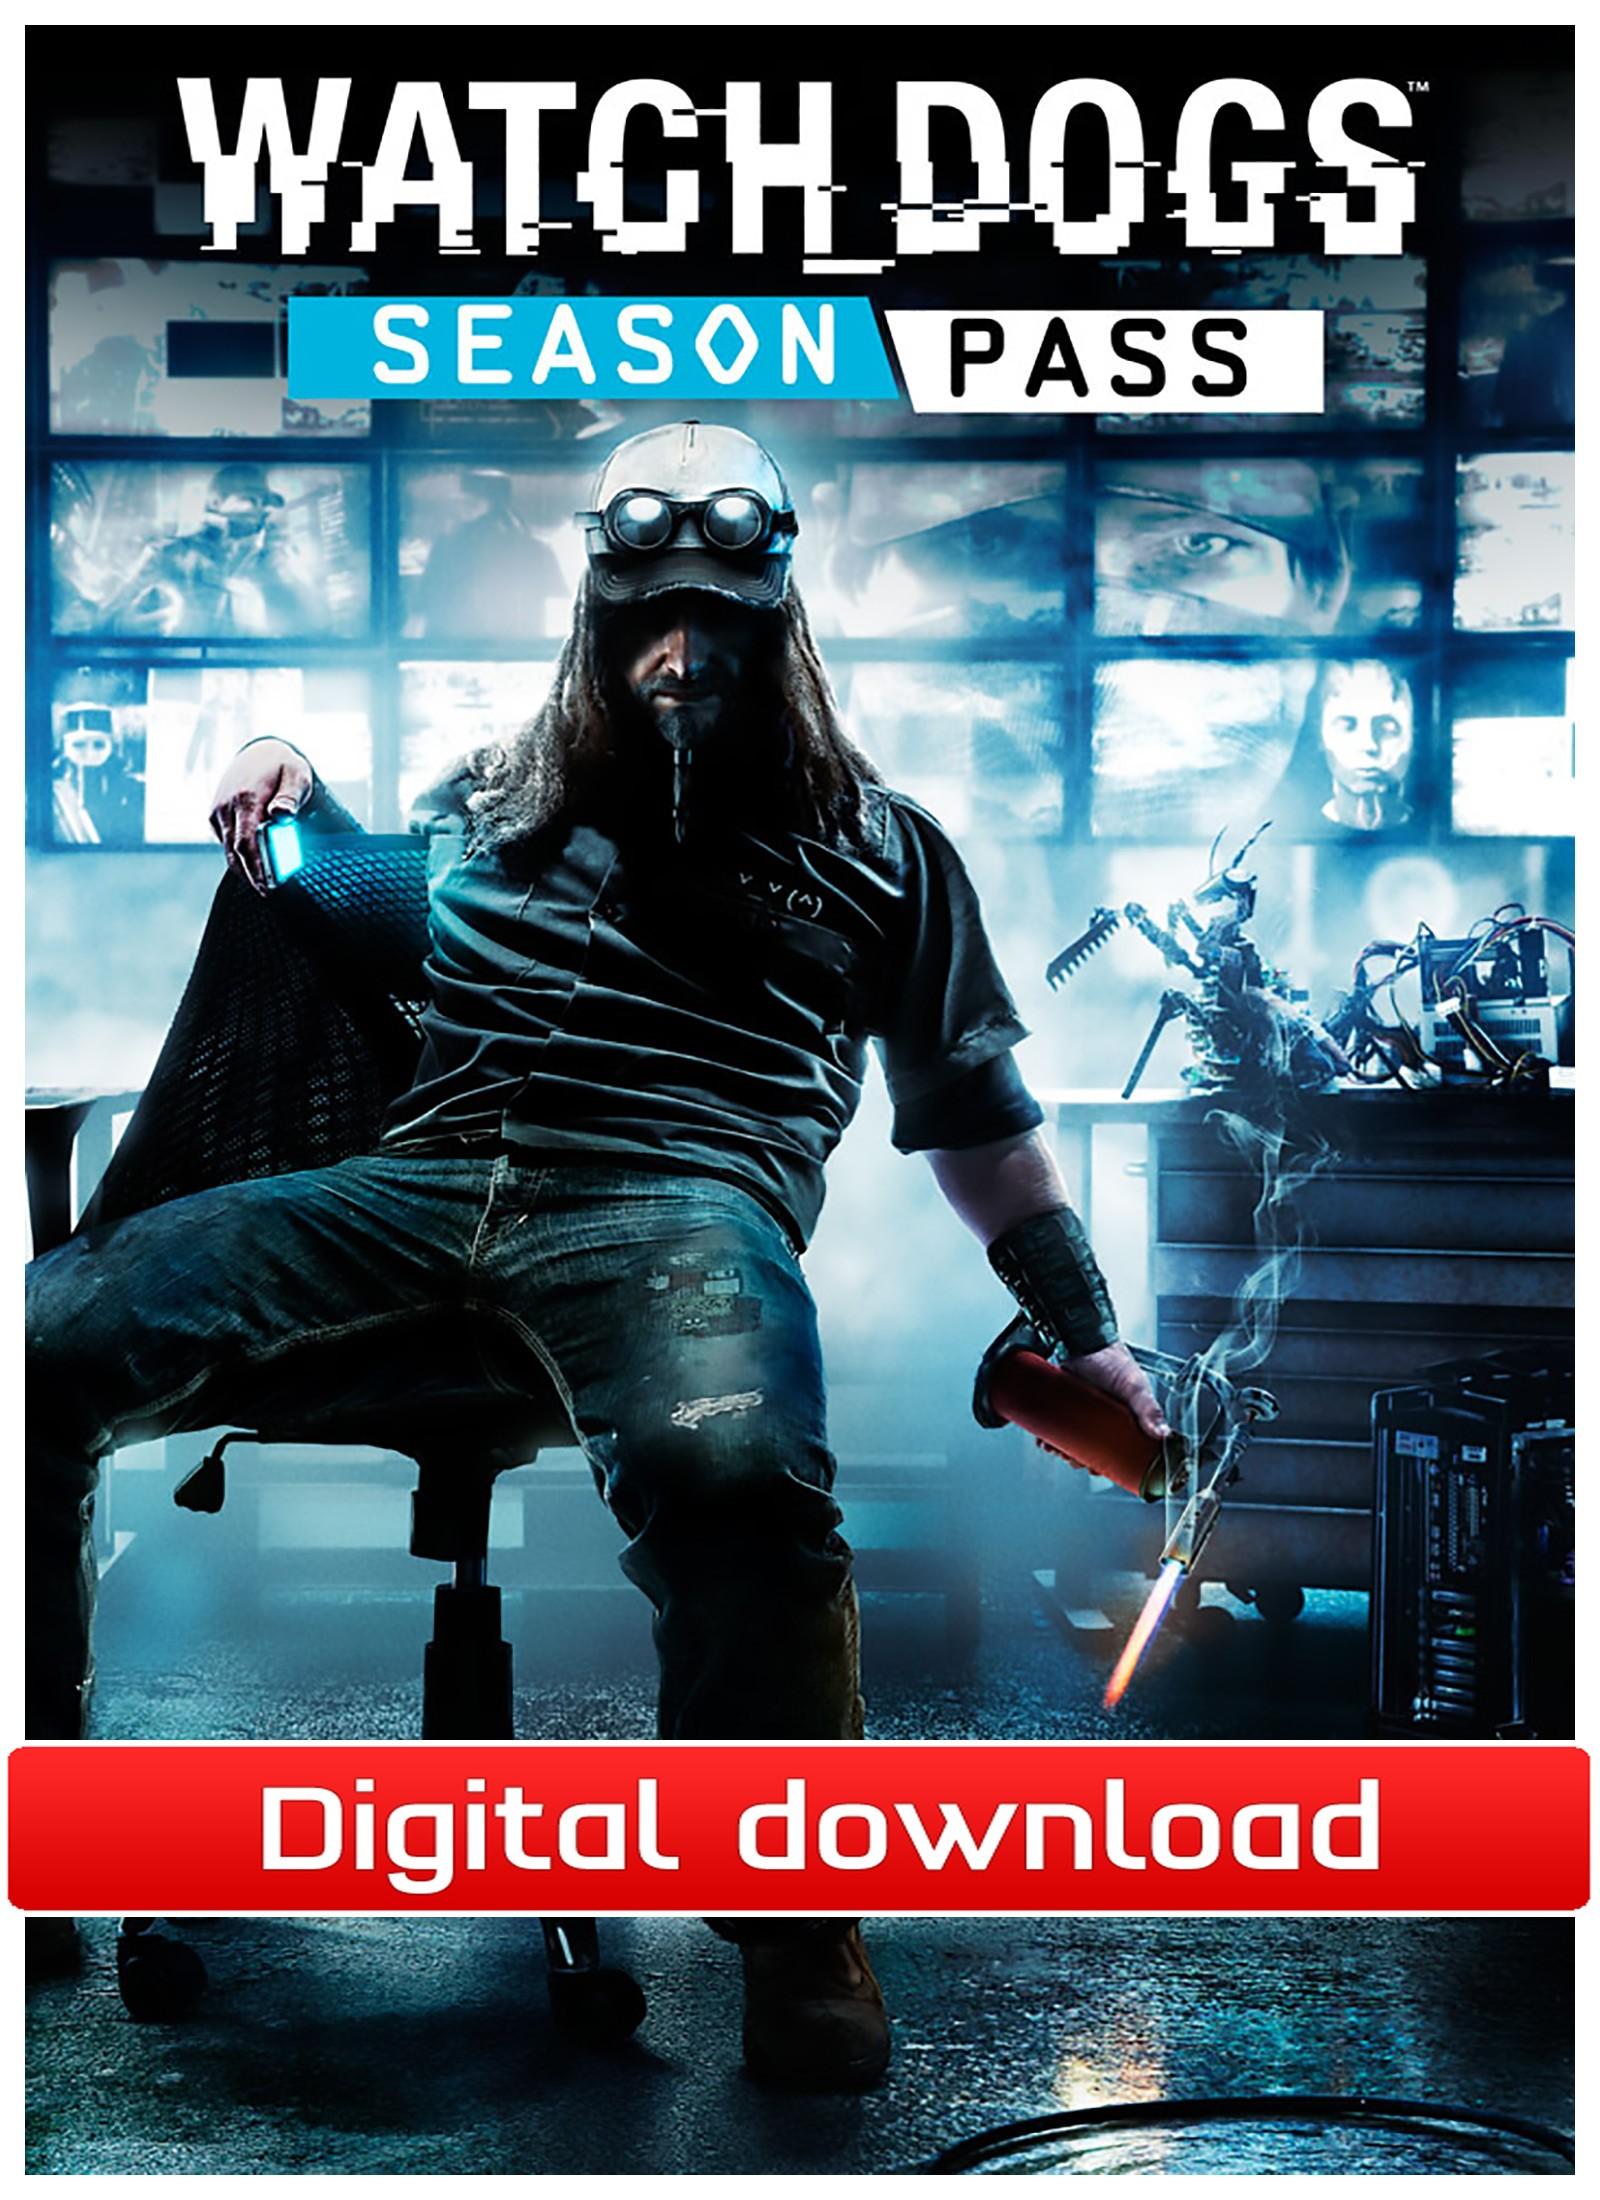 34039 : Watch Dogs: Season Pass (PC nedlastning)